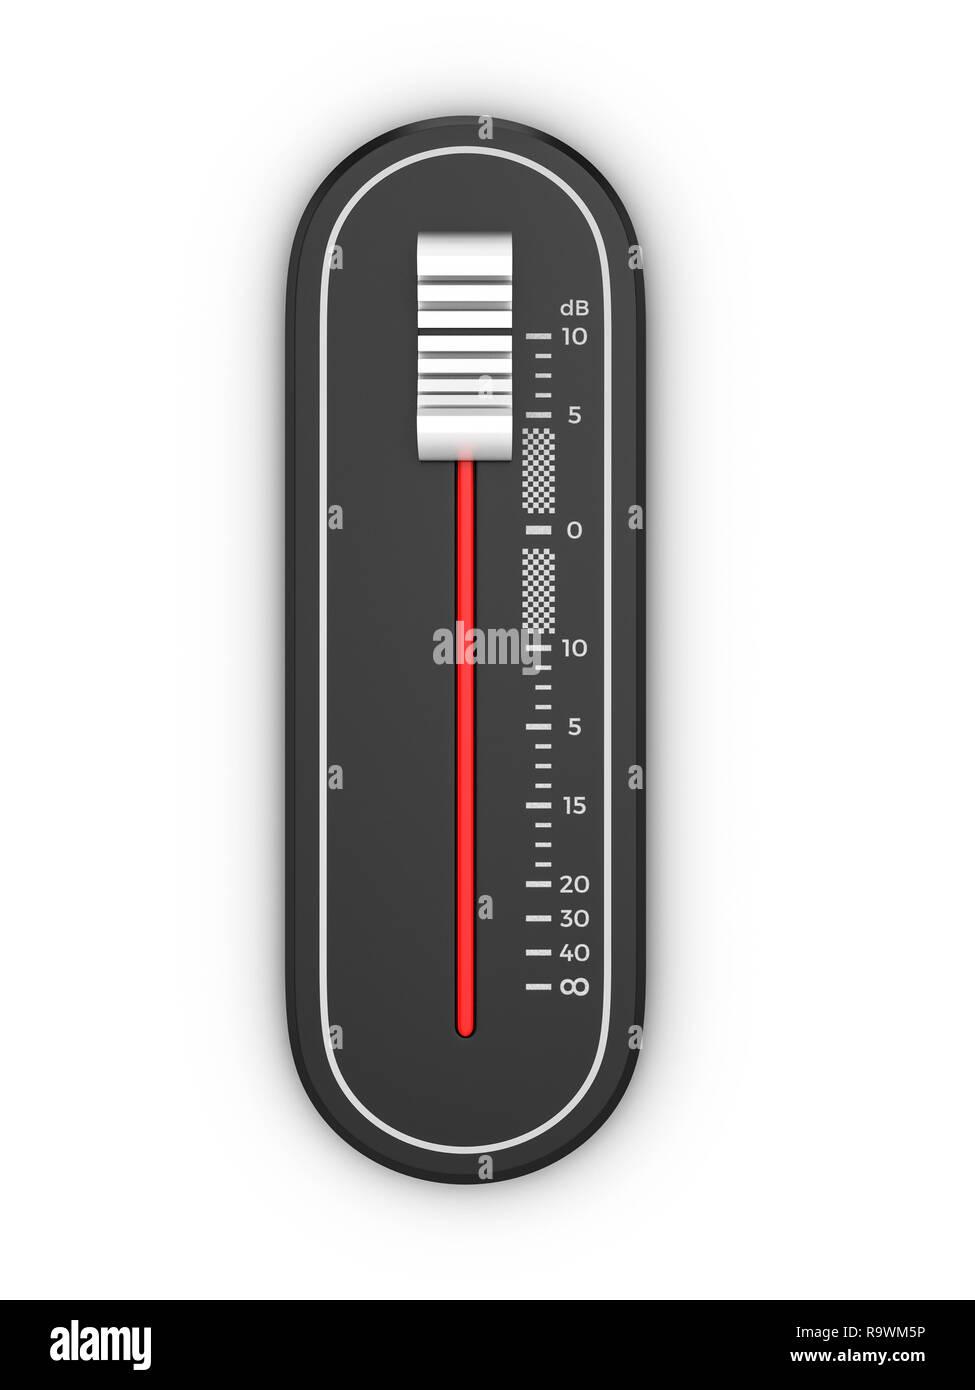 dj-sound-mixing-console-with-slider-3d-illustration-R9WM5P.jpg